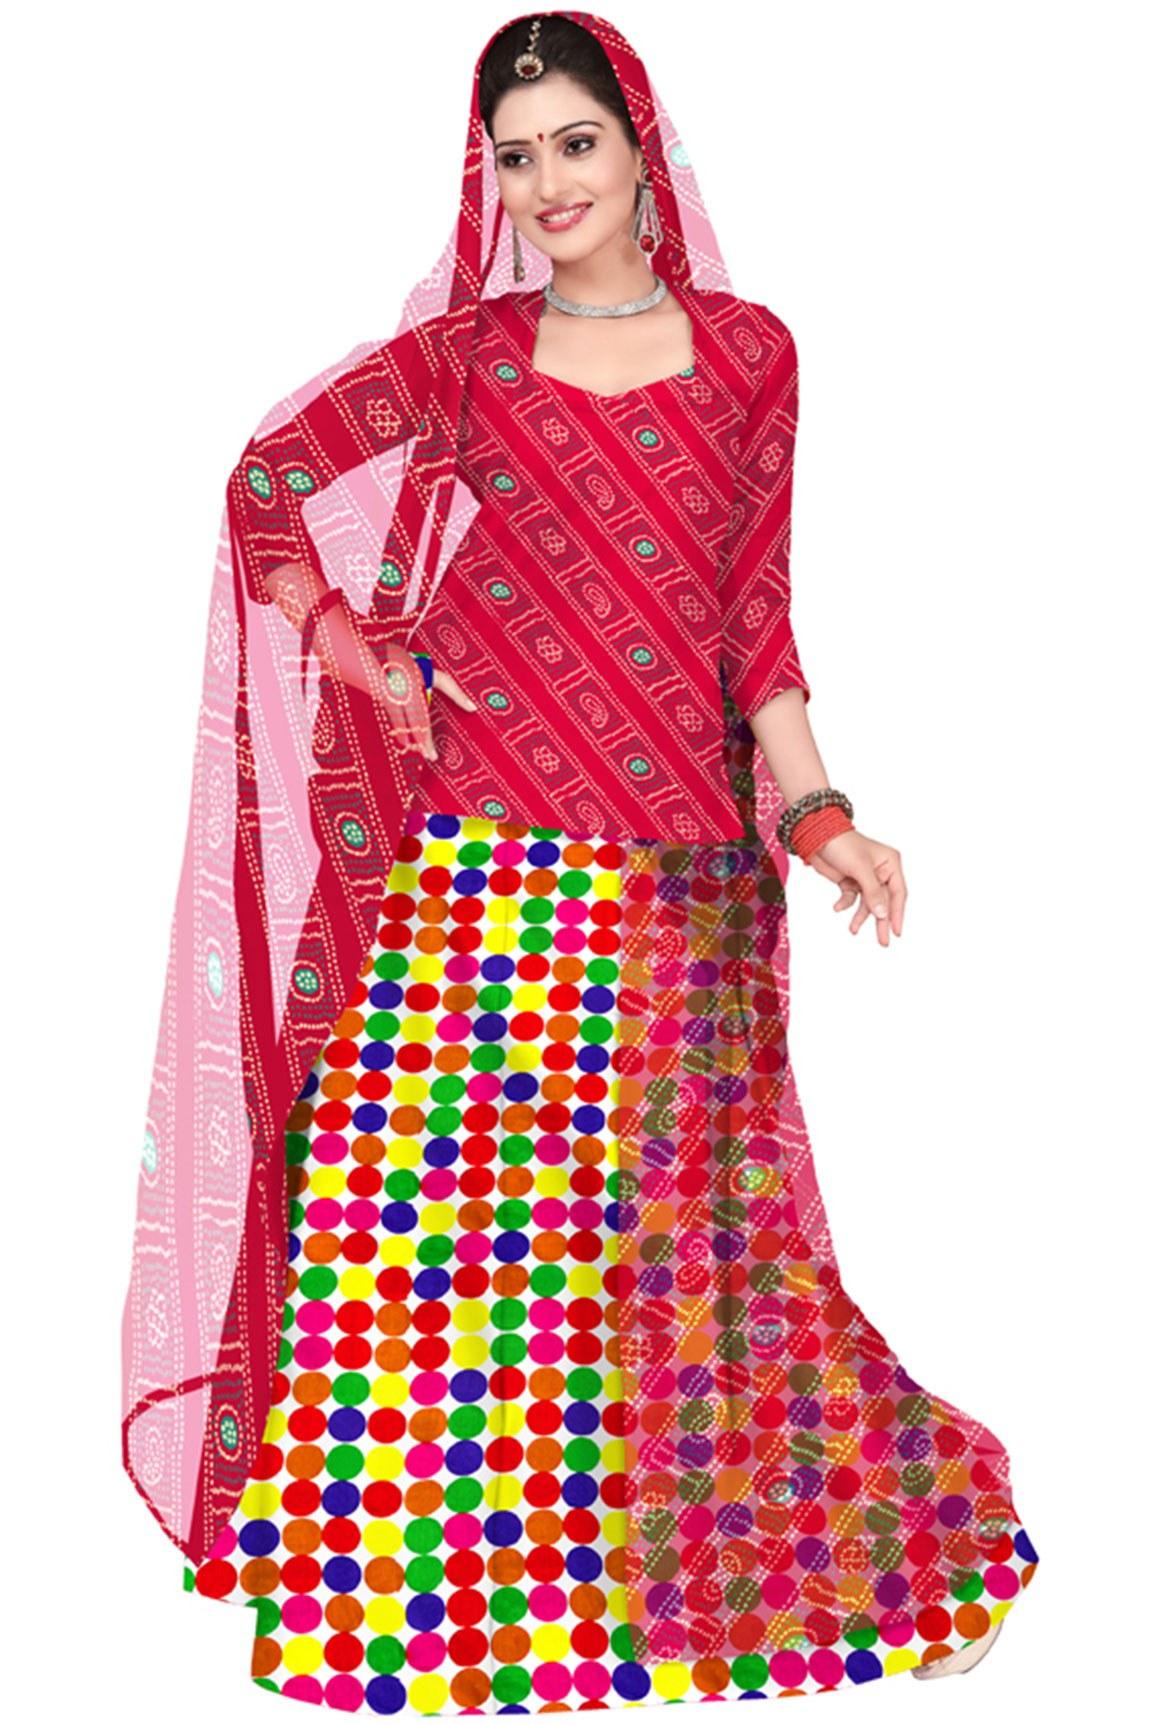 Creative Admyrin OffWhite And Red Rajasthani Poshak  Buy Admyrin OffWhite